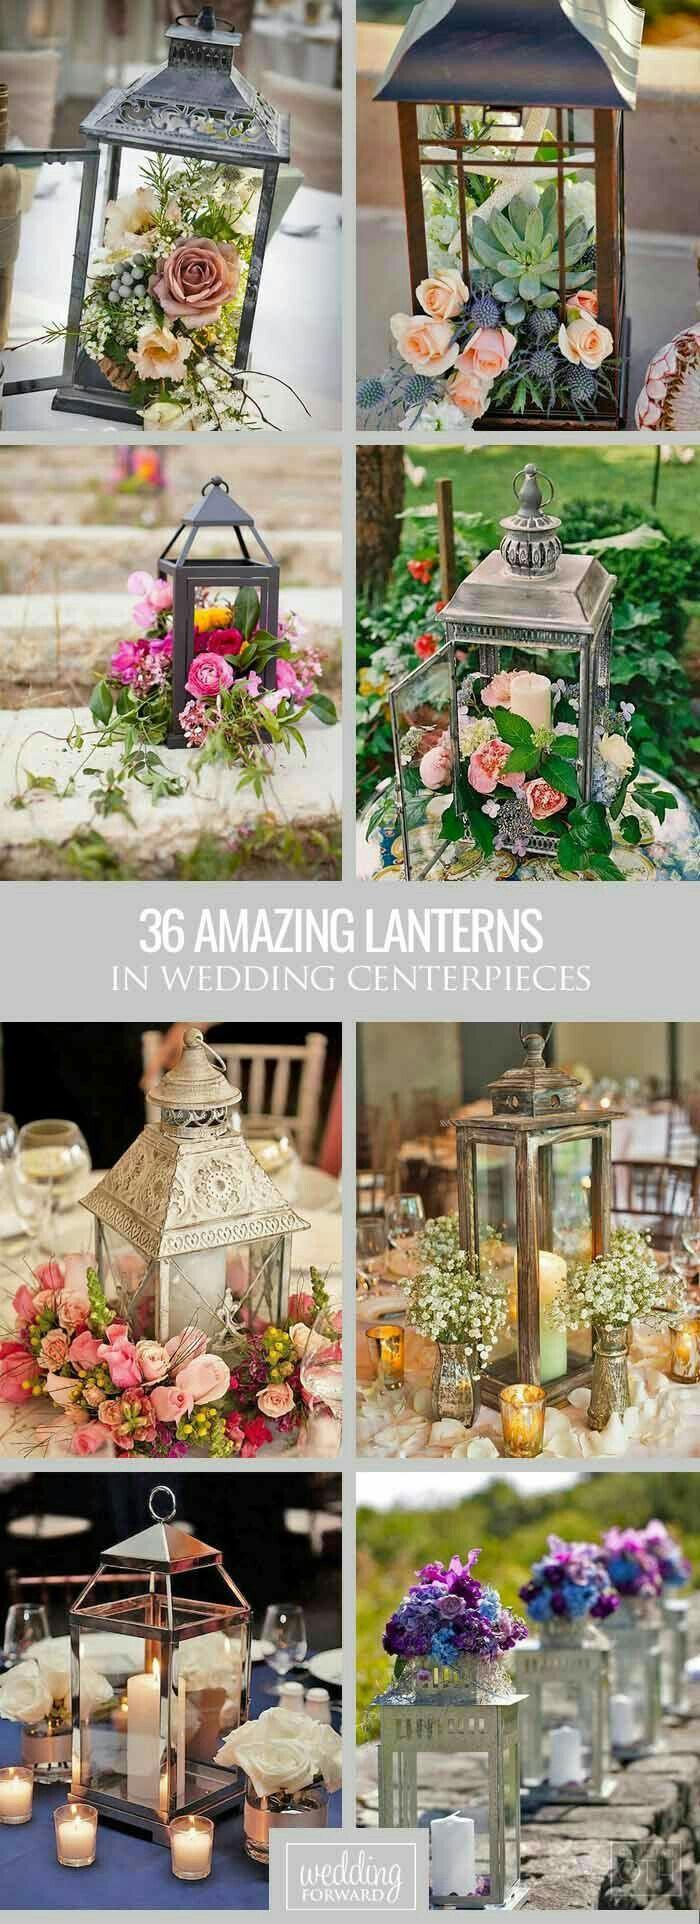 Fab candles in hanging lanterns  Wedding ideas  Pinterest